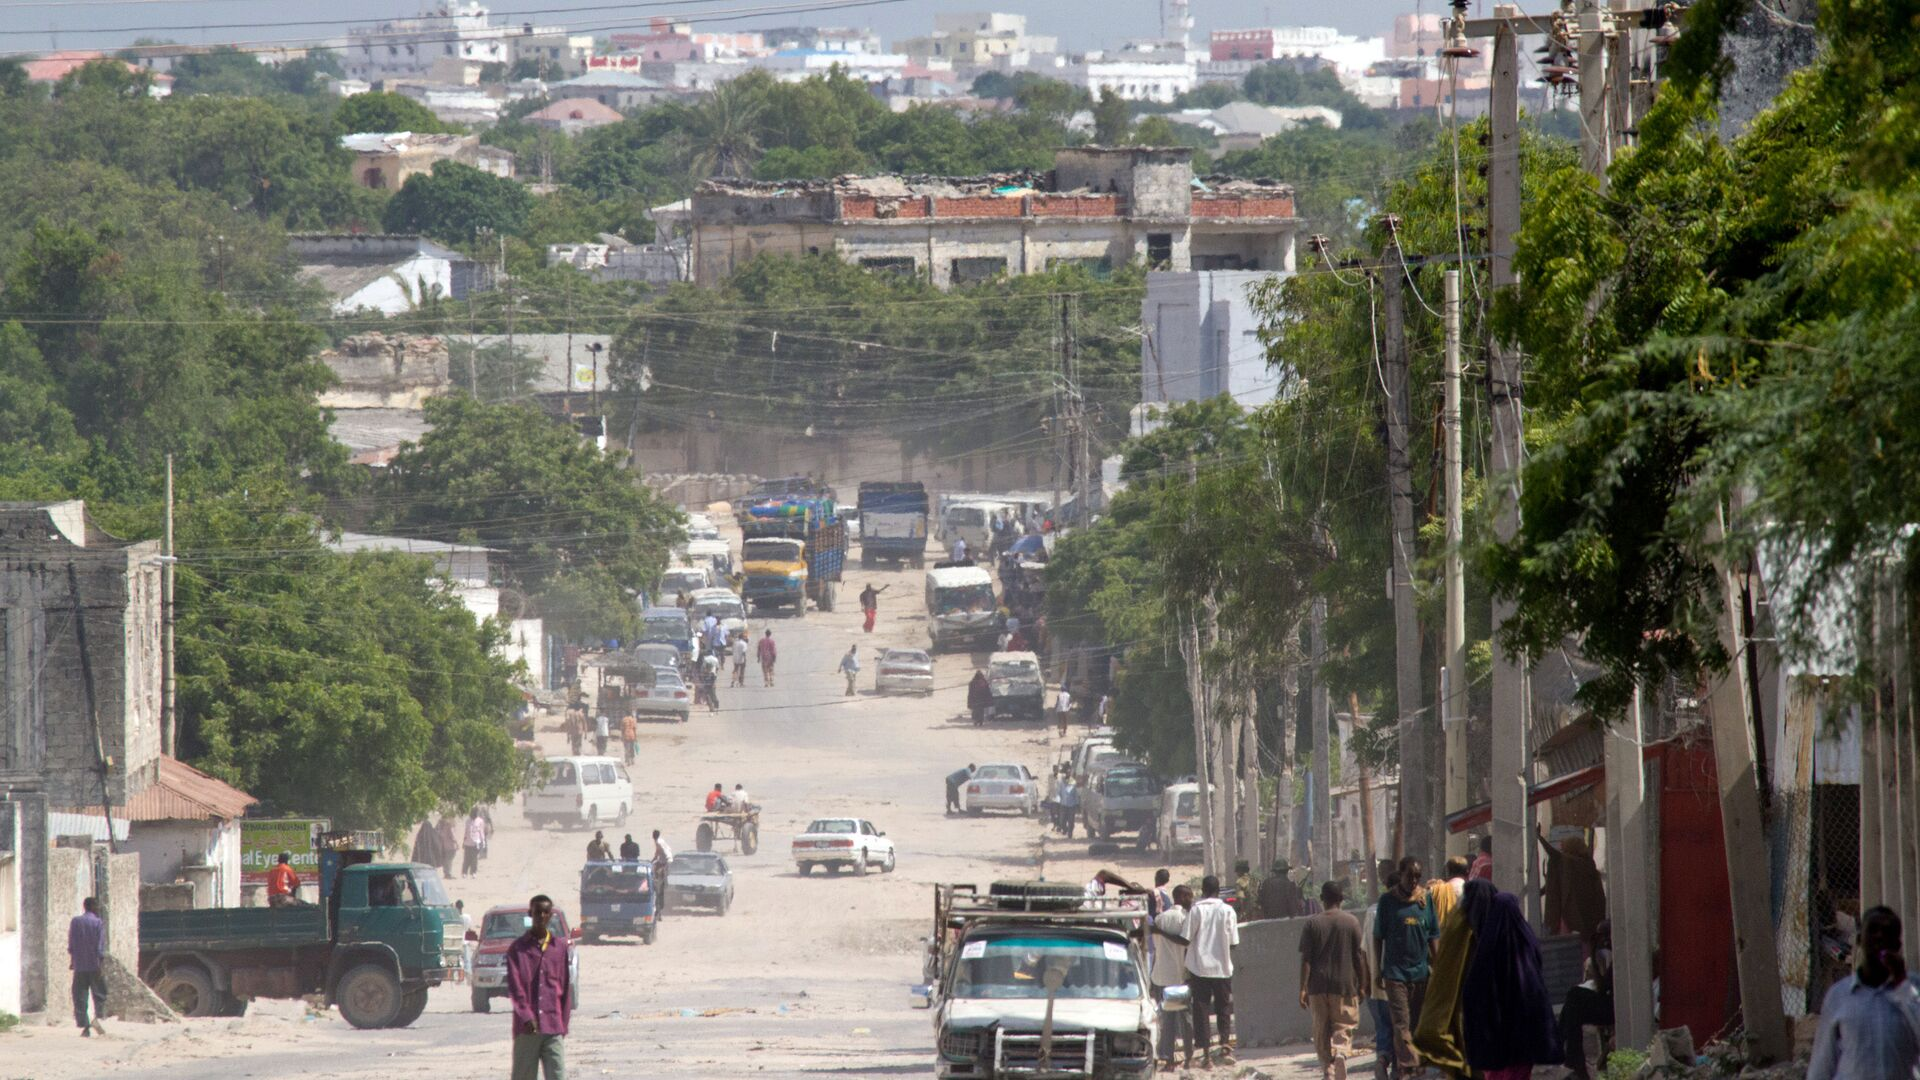 Mogadiscio, image d'illustration  - Sputnik France, 1920, 25.09.2021